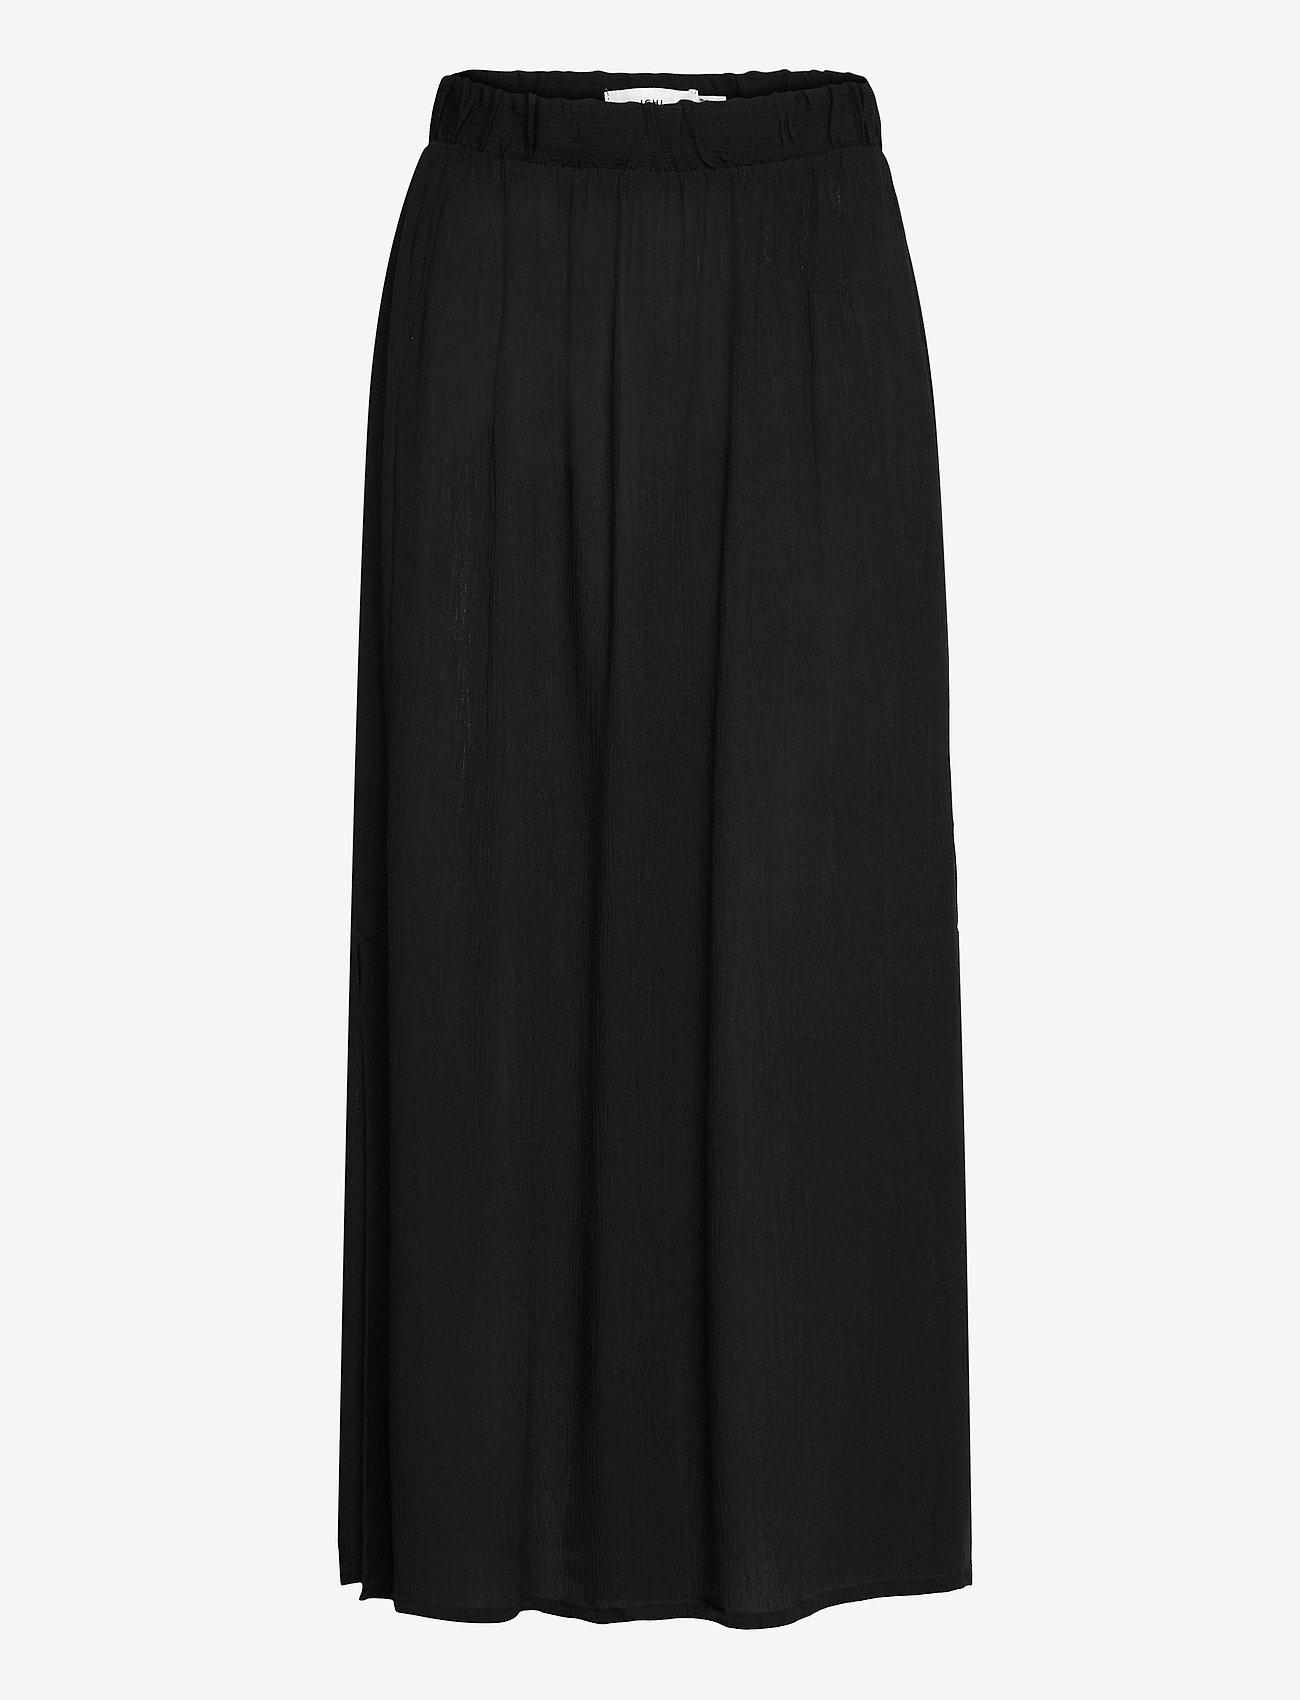 ICHI - IHMARRAKECH SO SK3 - midi skirts - black - 0